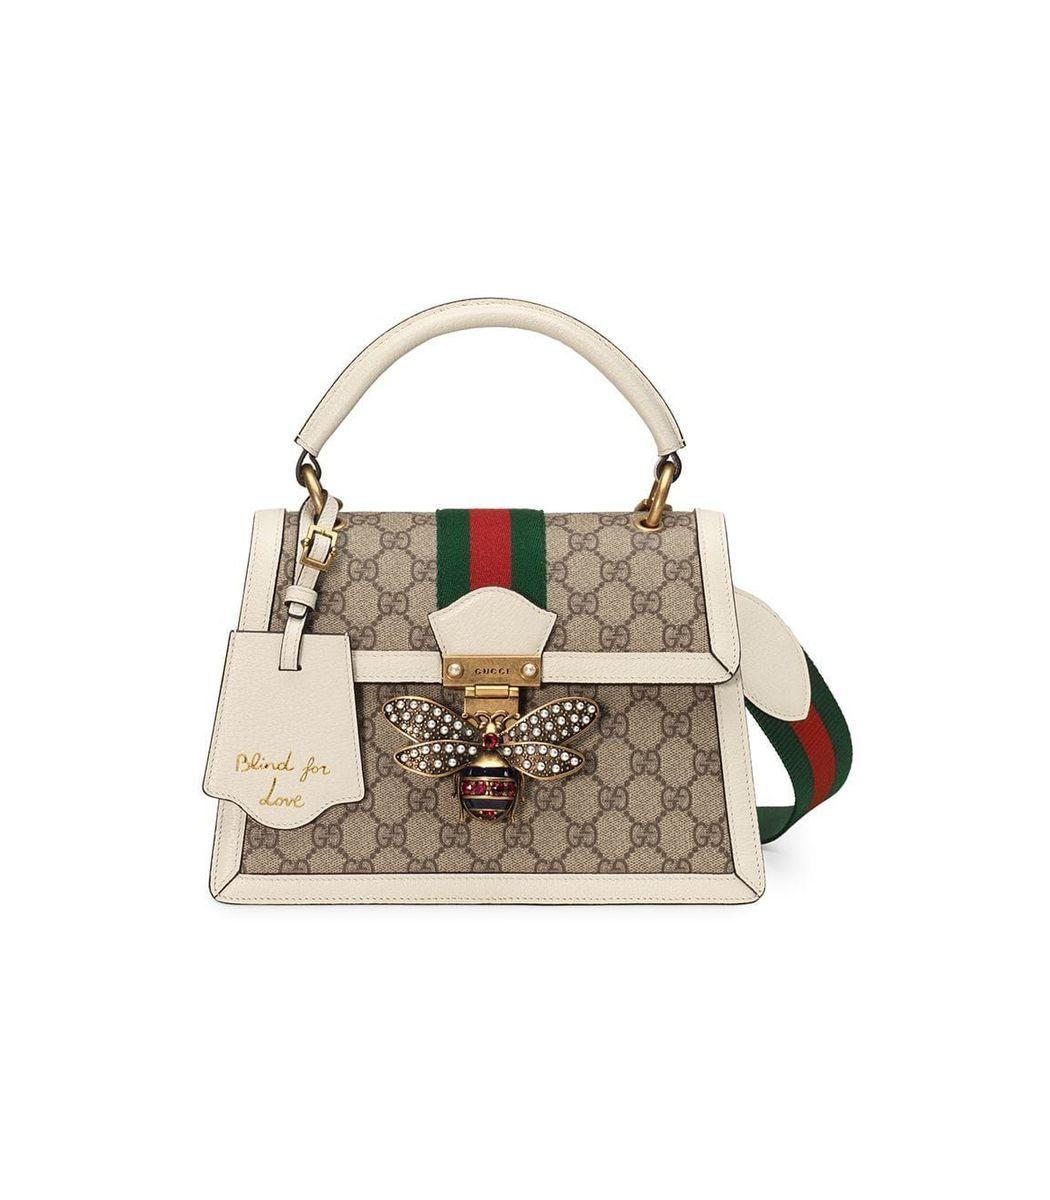 f6065baf8f62 Home / Gucci / Queen Margaret small GG Top Handle Bag. prev